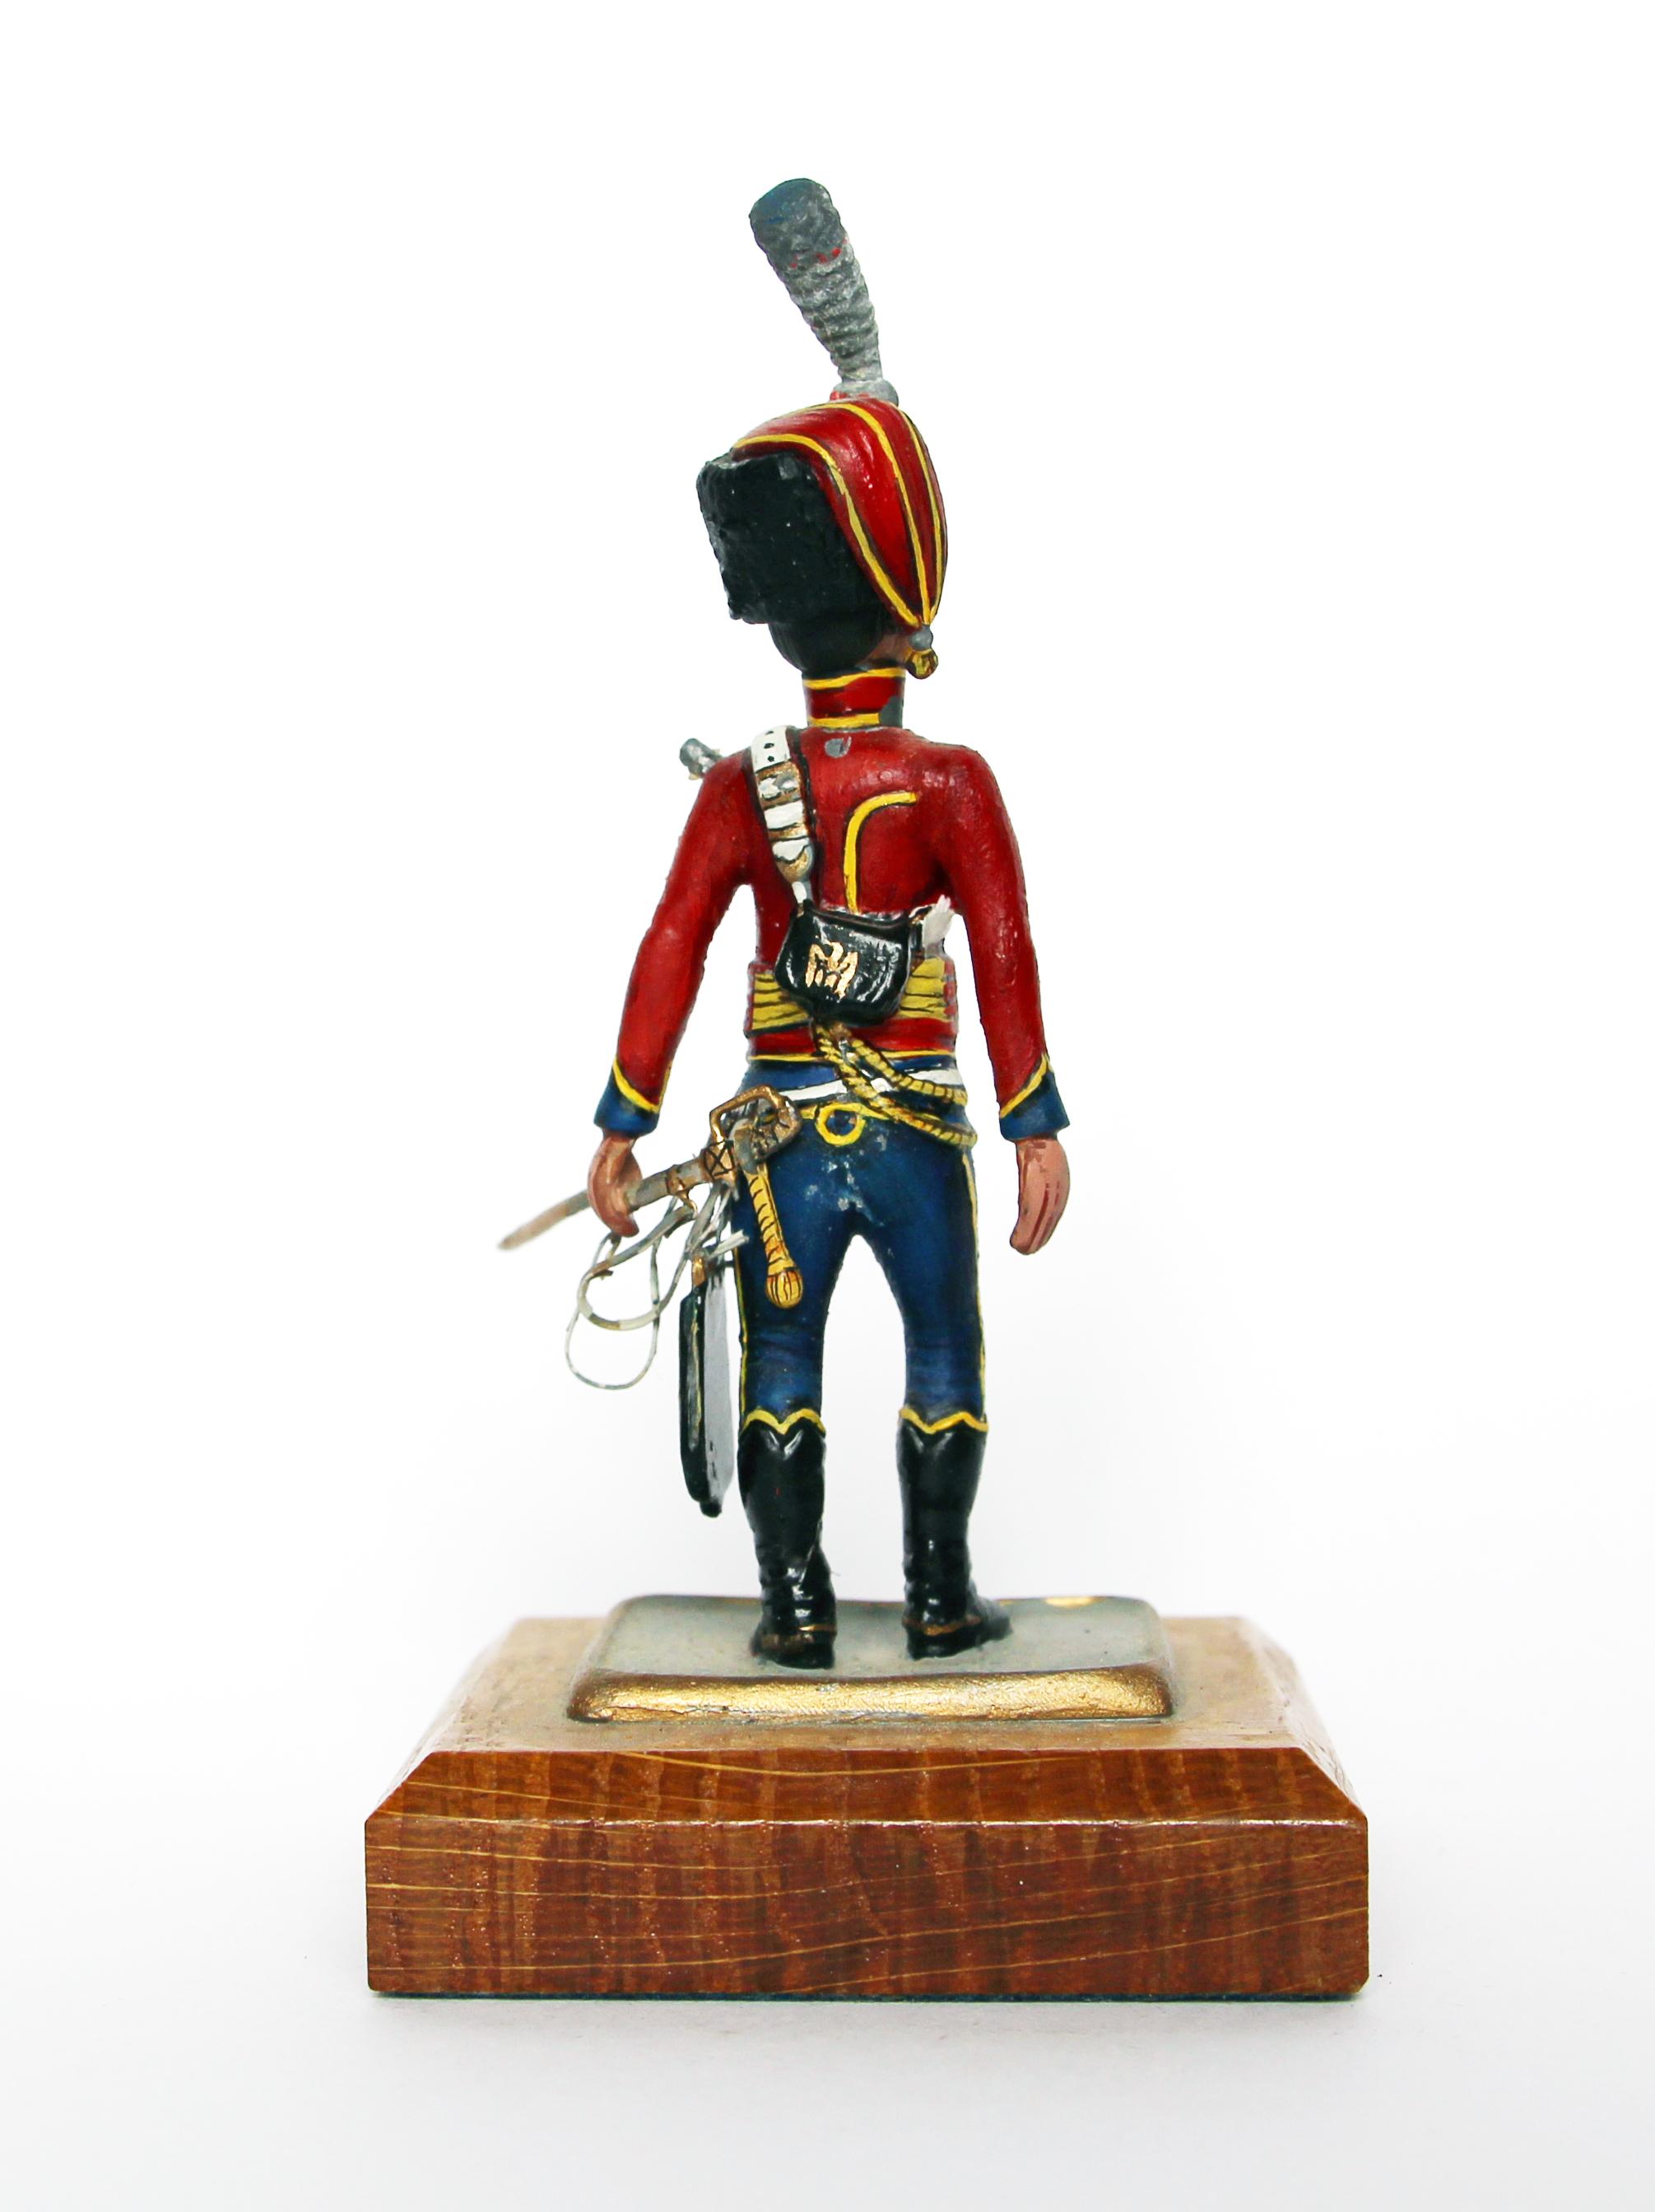 Figurine Series 77 - Peinture collectionneur -6em hussards - 1er Empire 1809